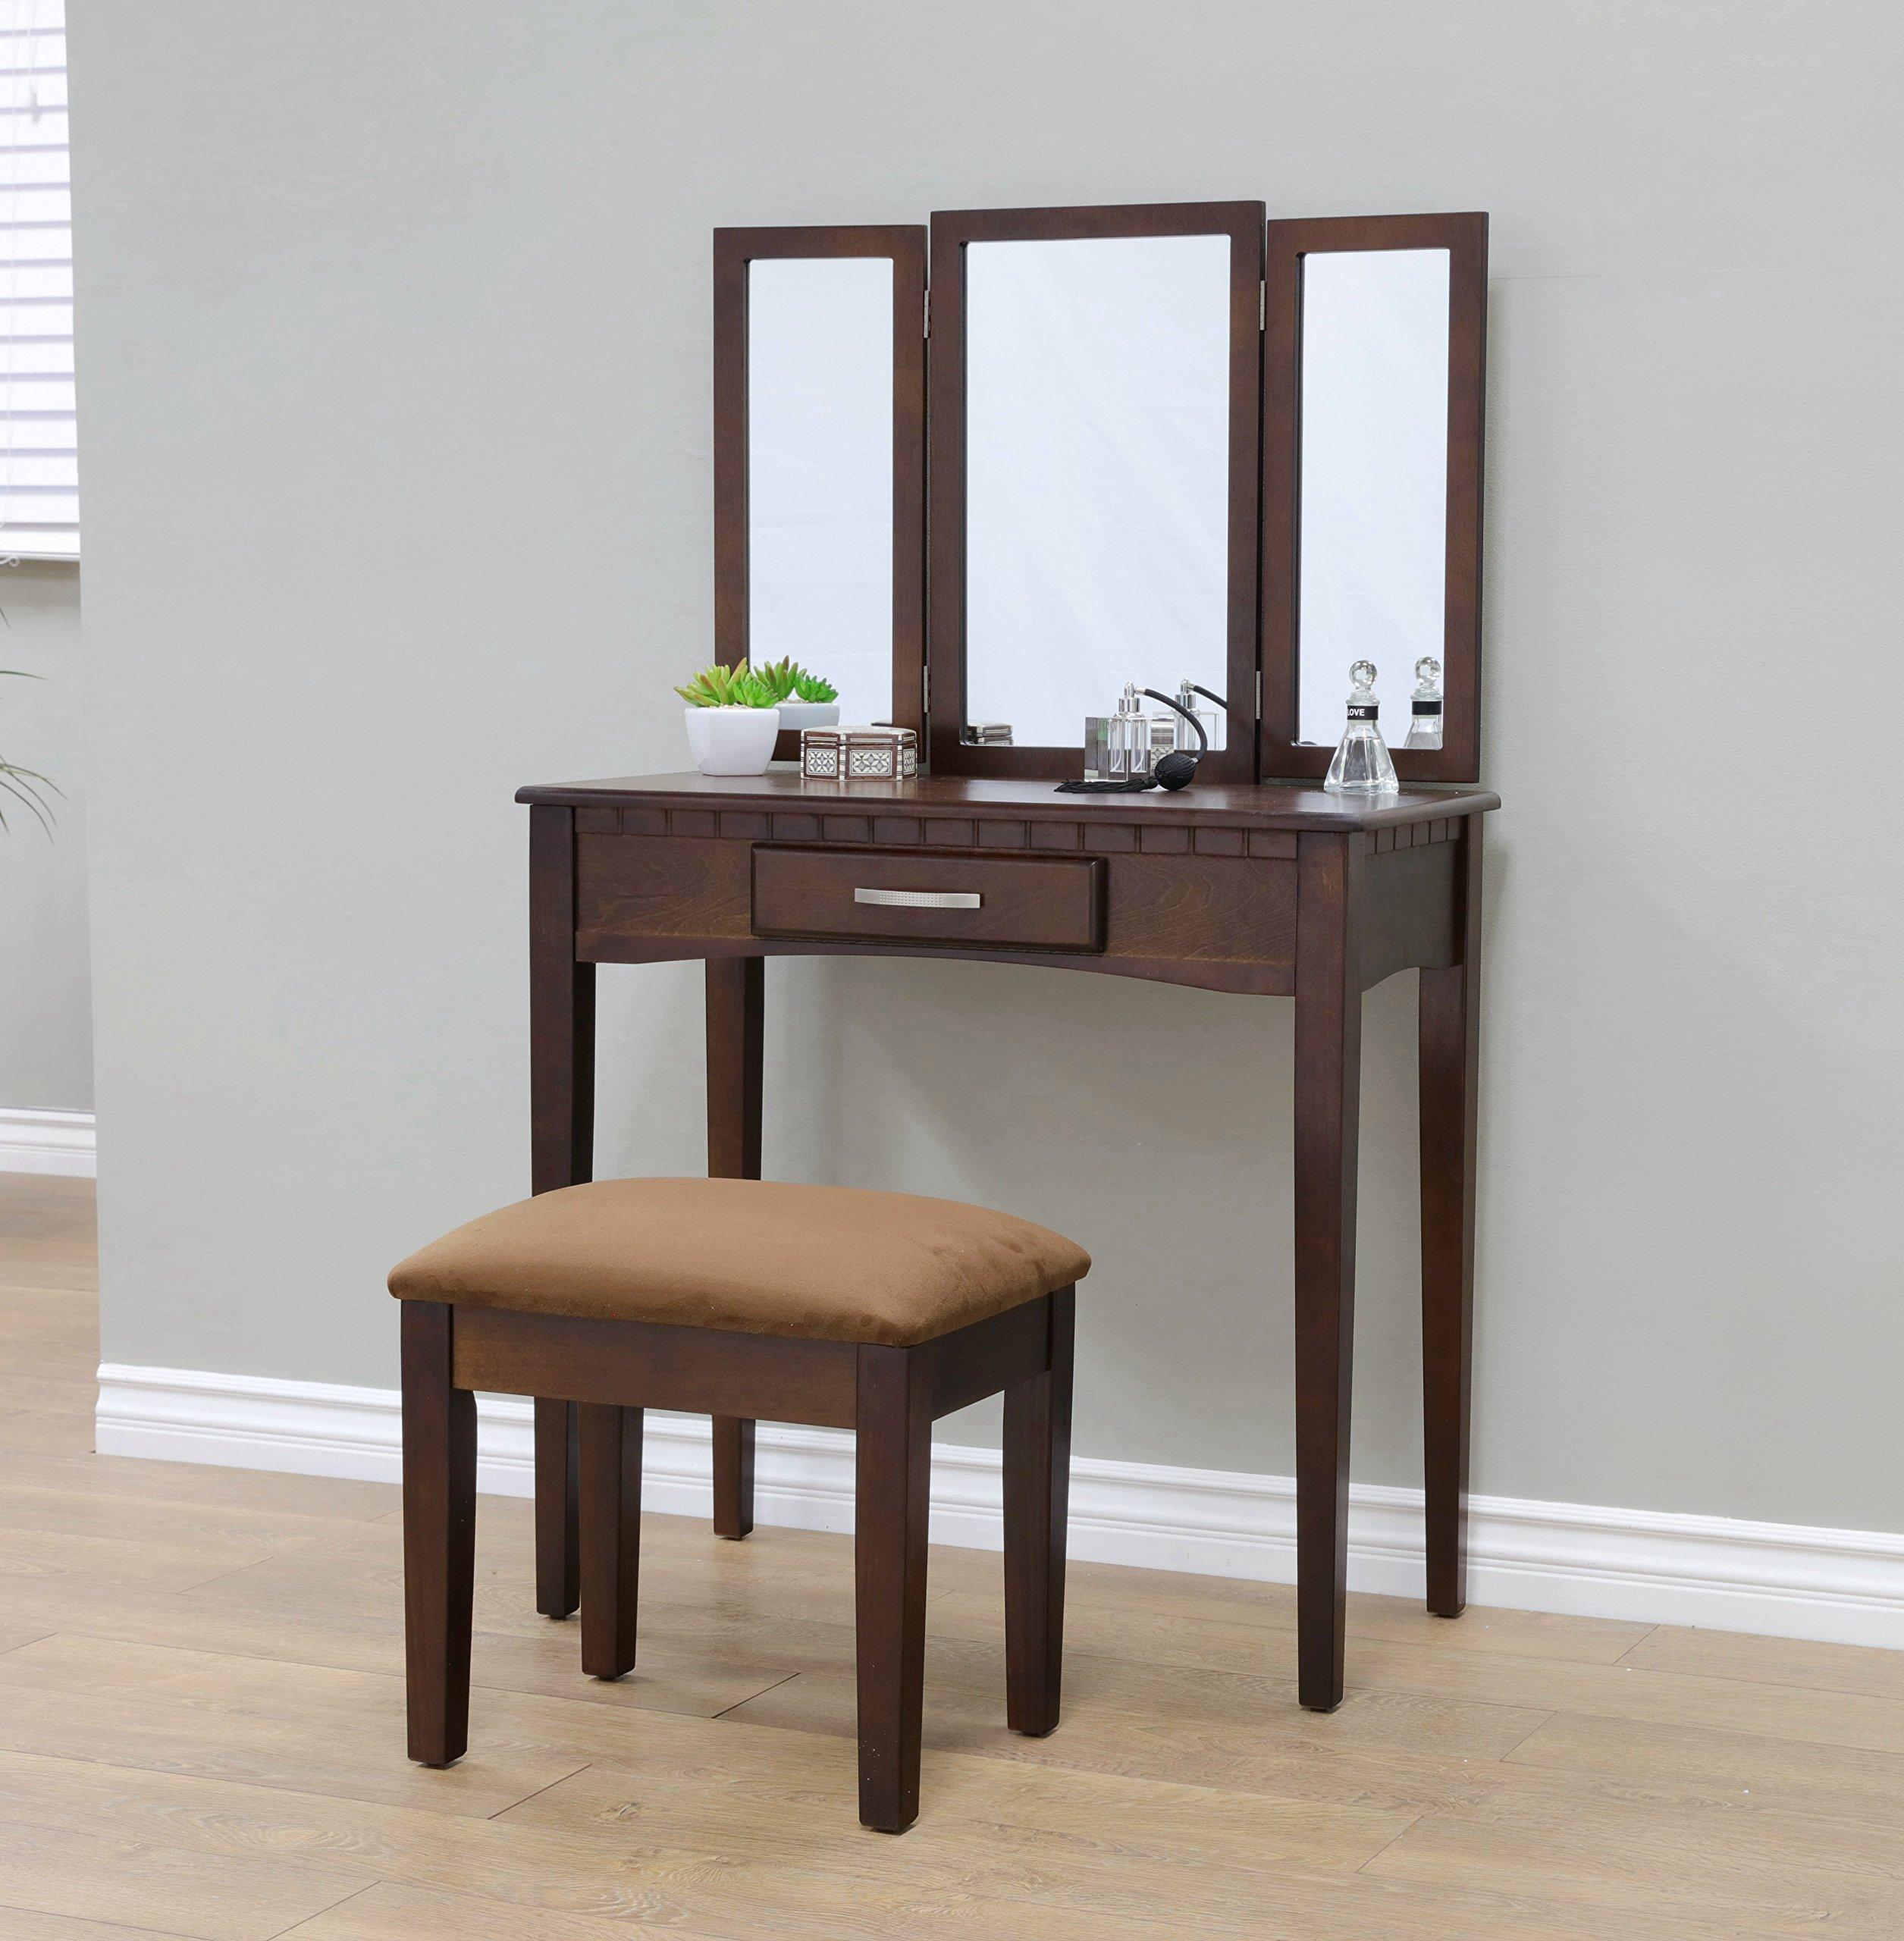 Mirrored Vanity Stool Set Espresso Dark Wood 3 Mirrors Bedroom Makeup Table  NEW